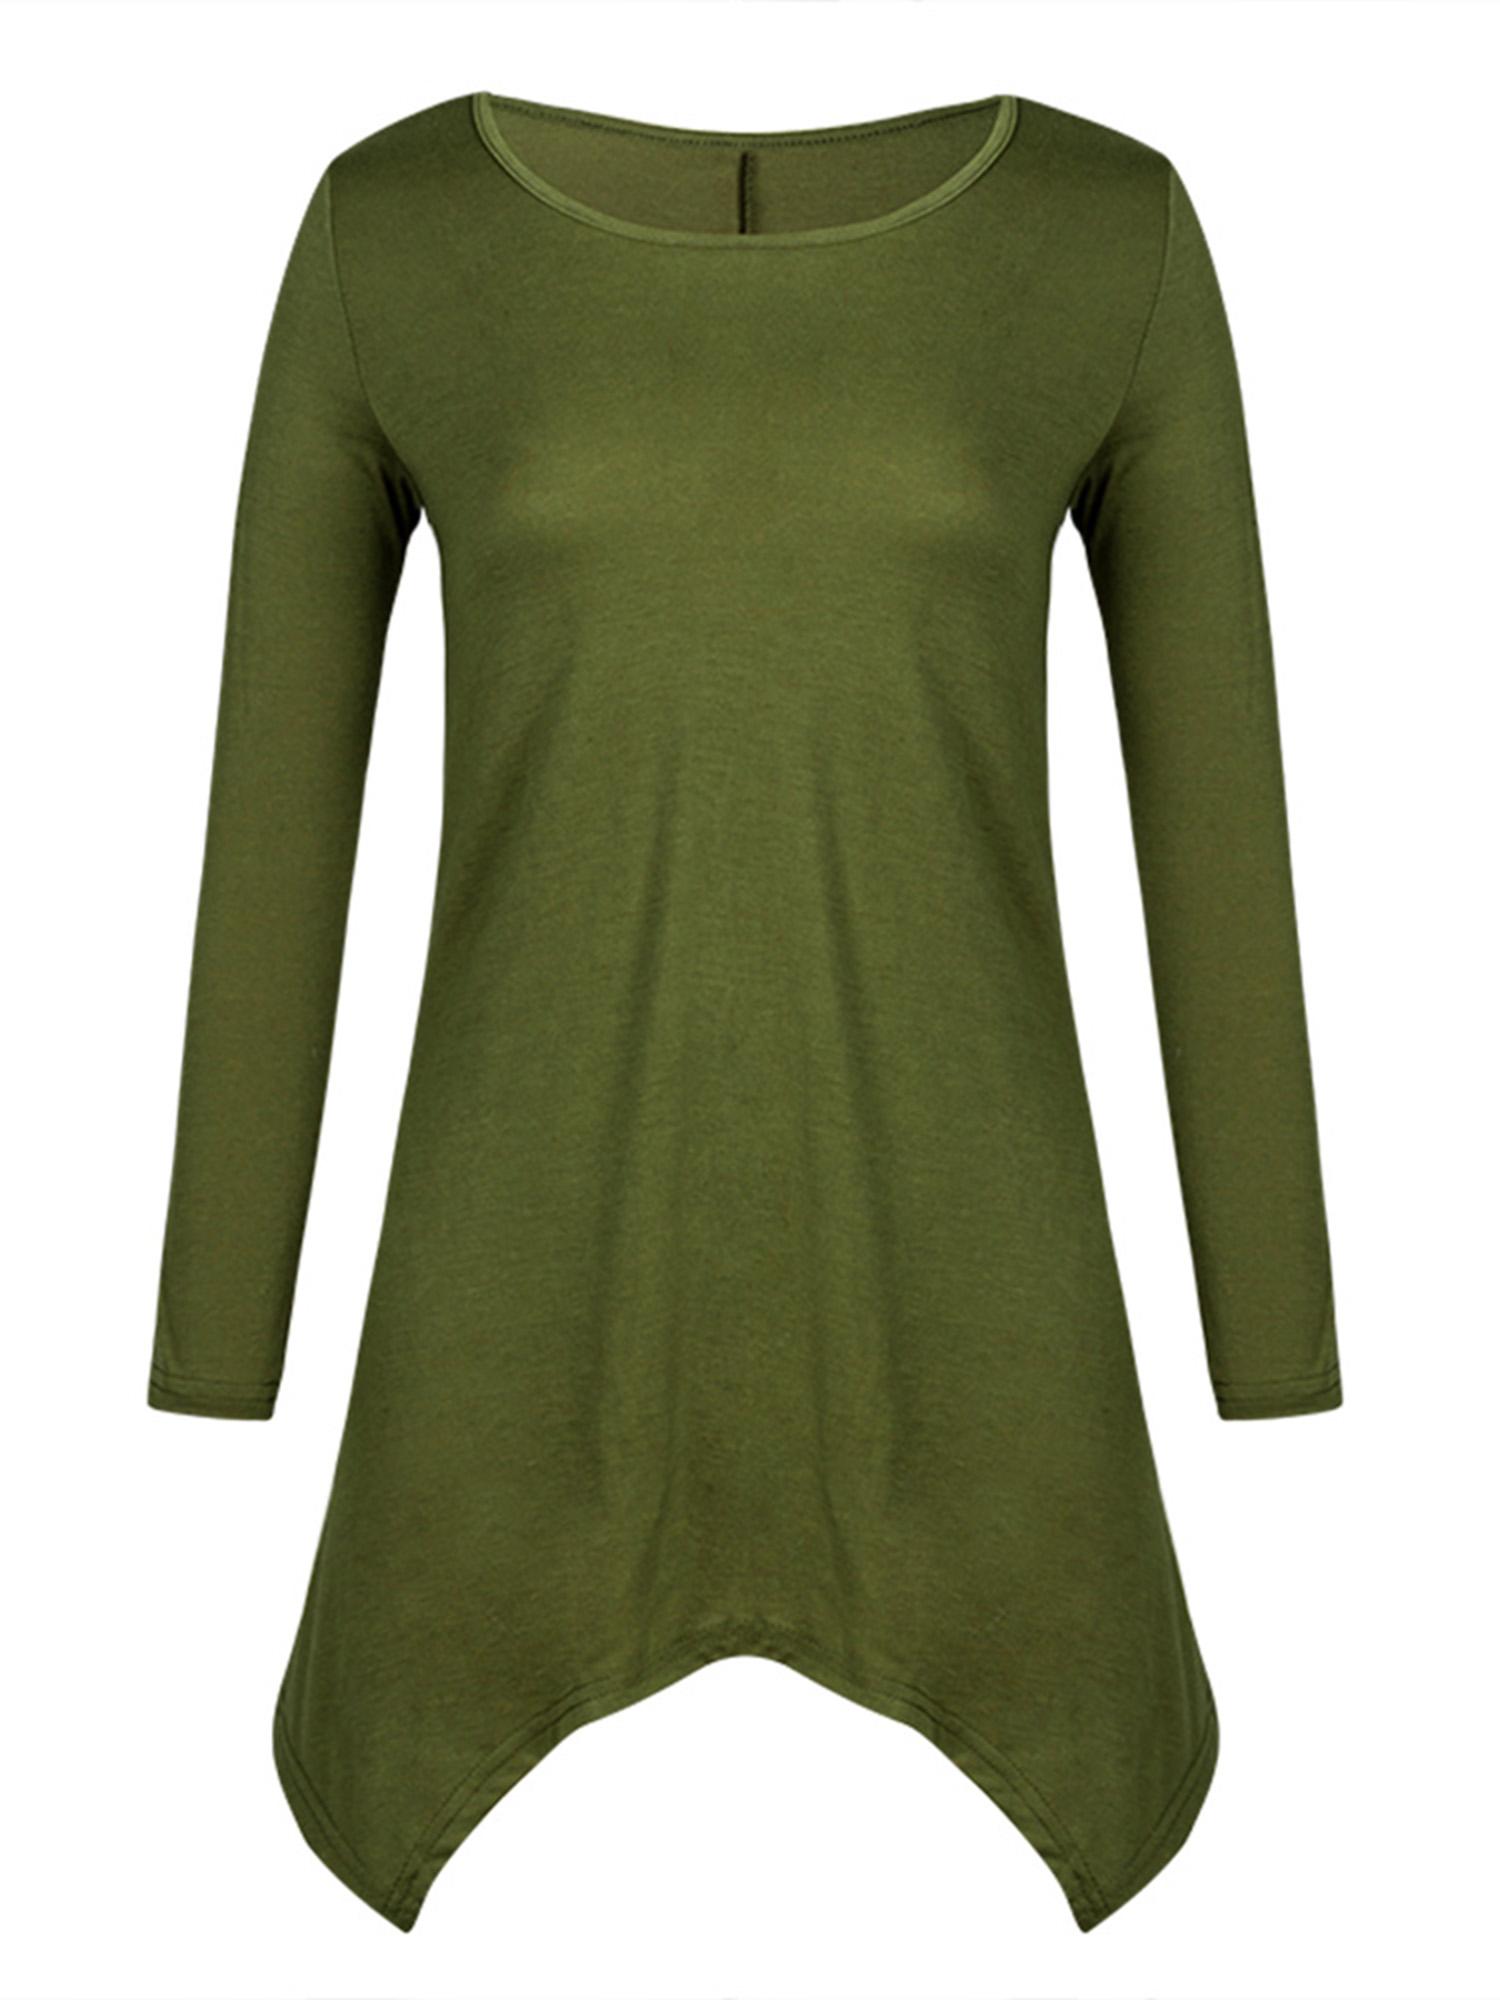 Phoebe Cat 3/4 Sleeve Tunic Tops Dress for Women, Irregular Hem Pullover...